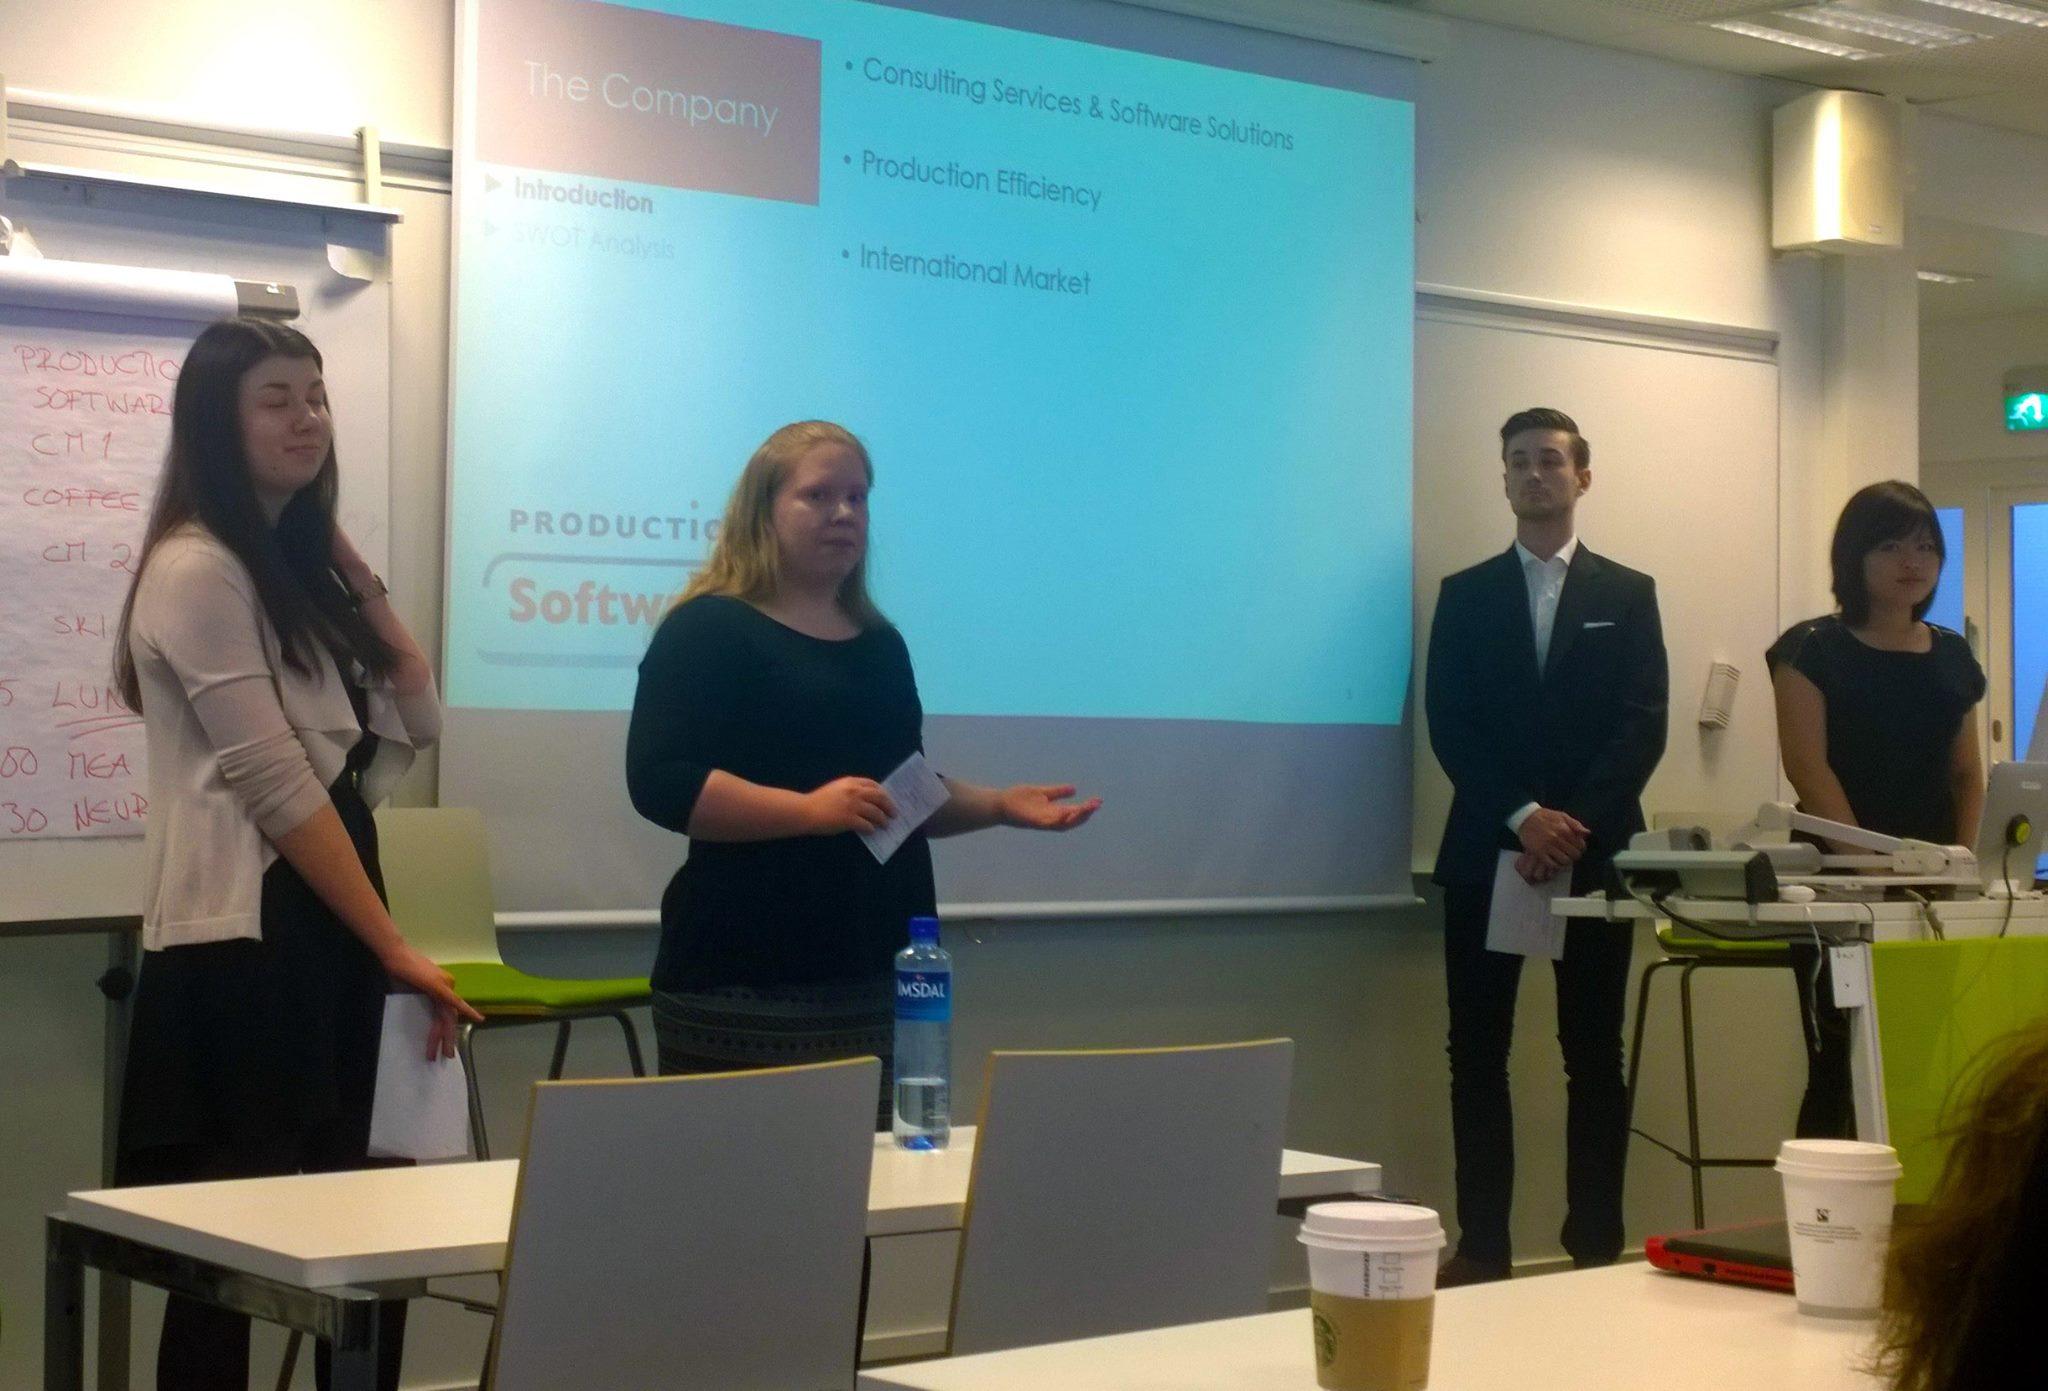 Karolin Kondrat, Francisca Johnsen, Eiður Aron Arnarson, Gia Khanh